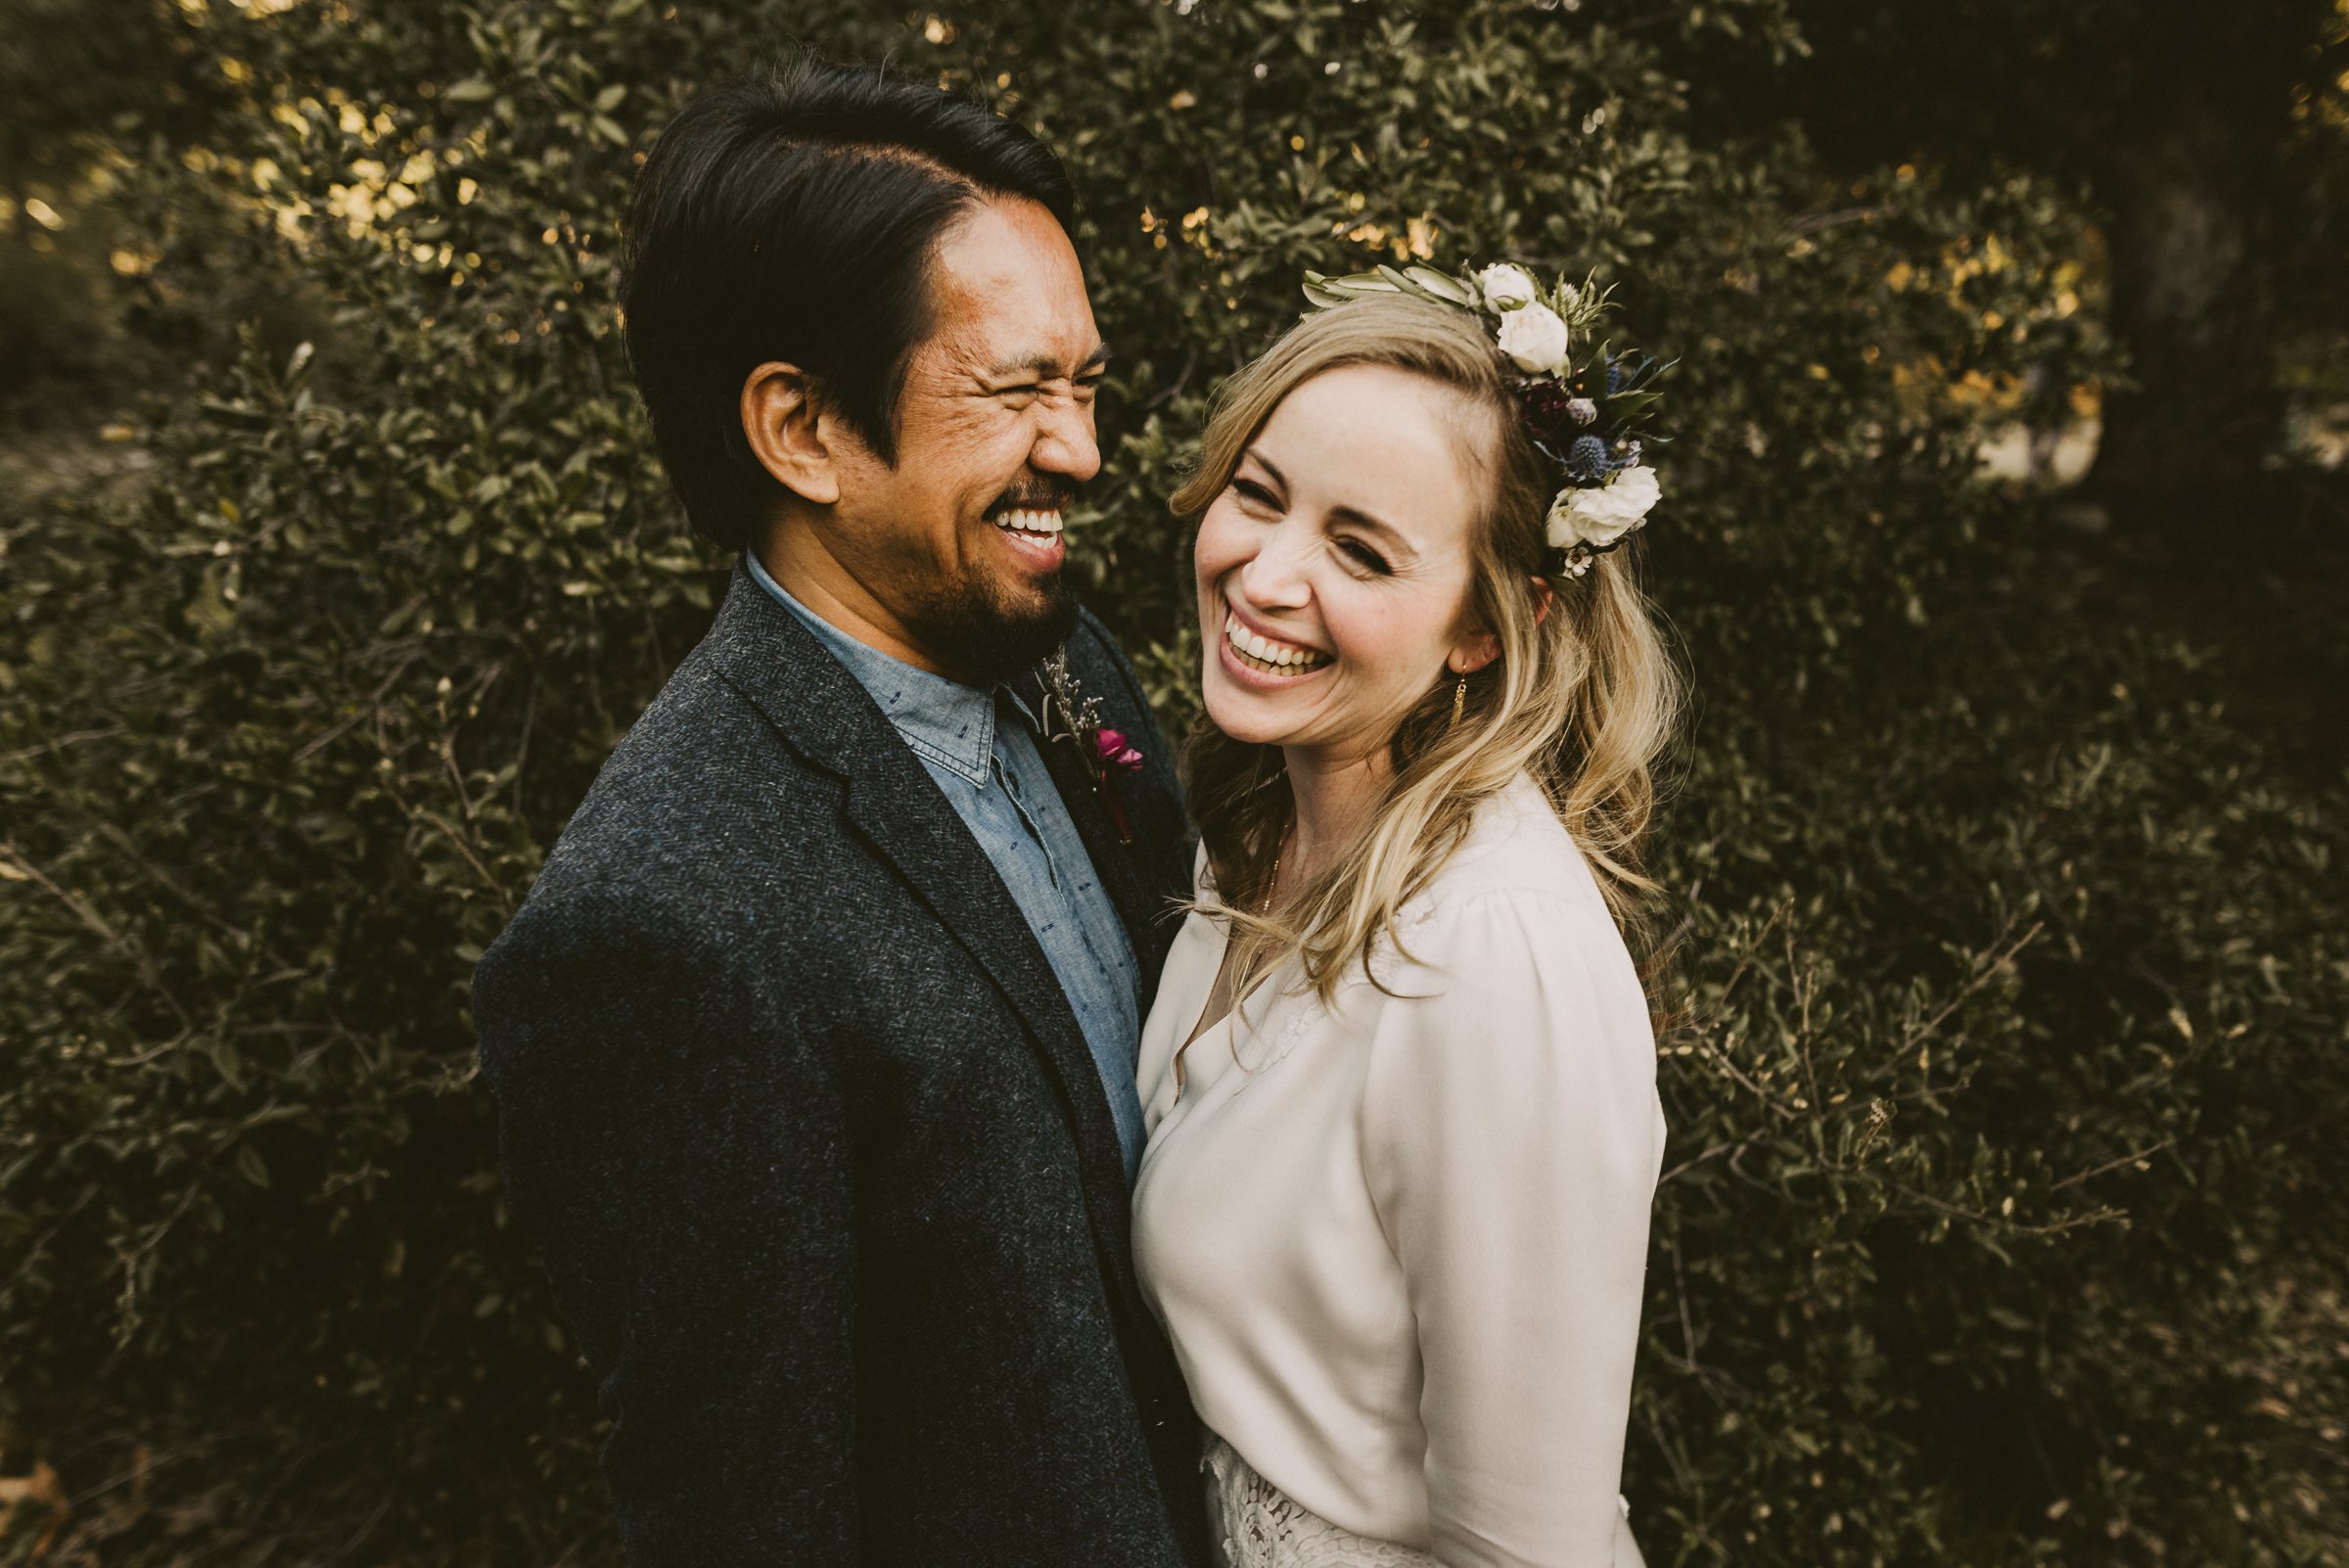 ©Isaiah + Taylor Photography - Intimate Elopement, Eaton Canyon, Los Angeles Wedding Photographer-56.jpg